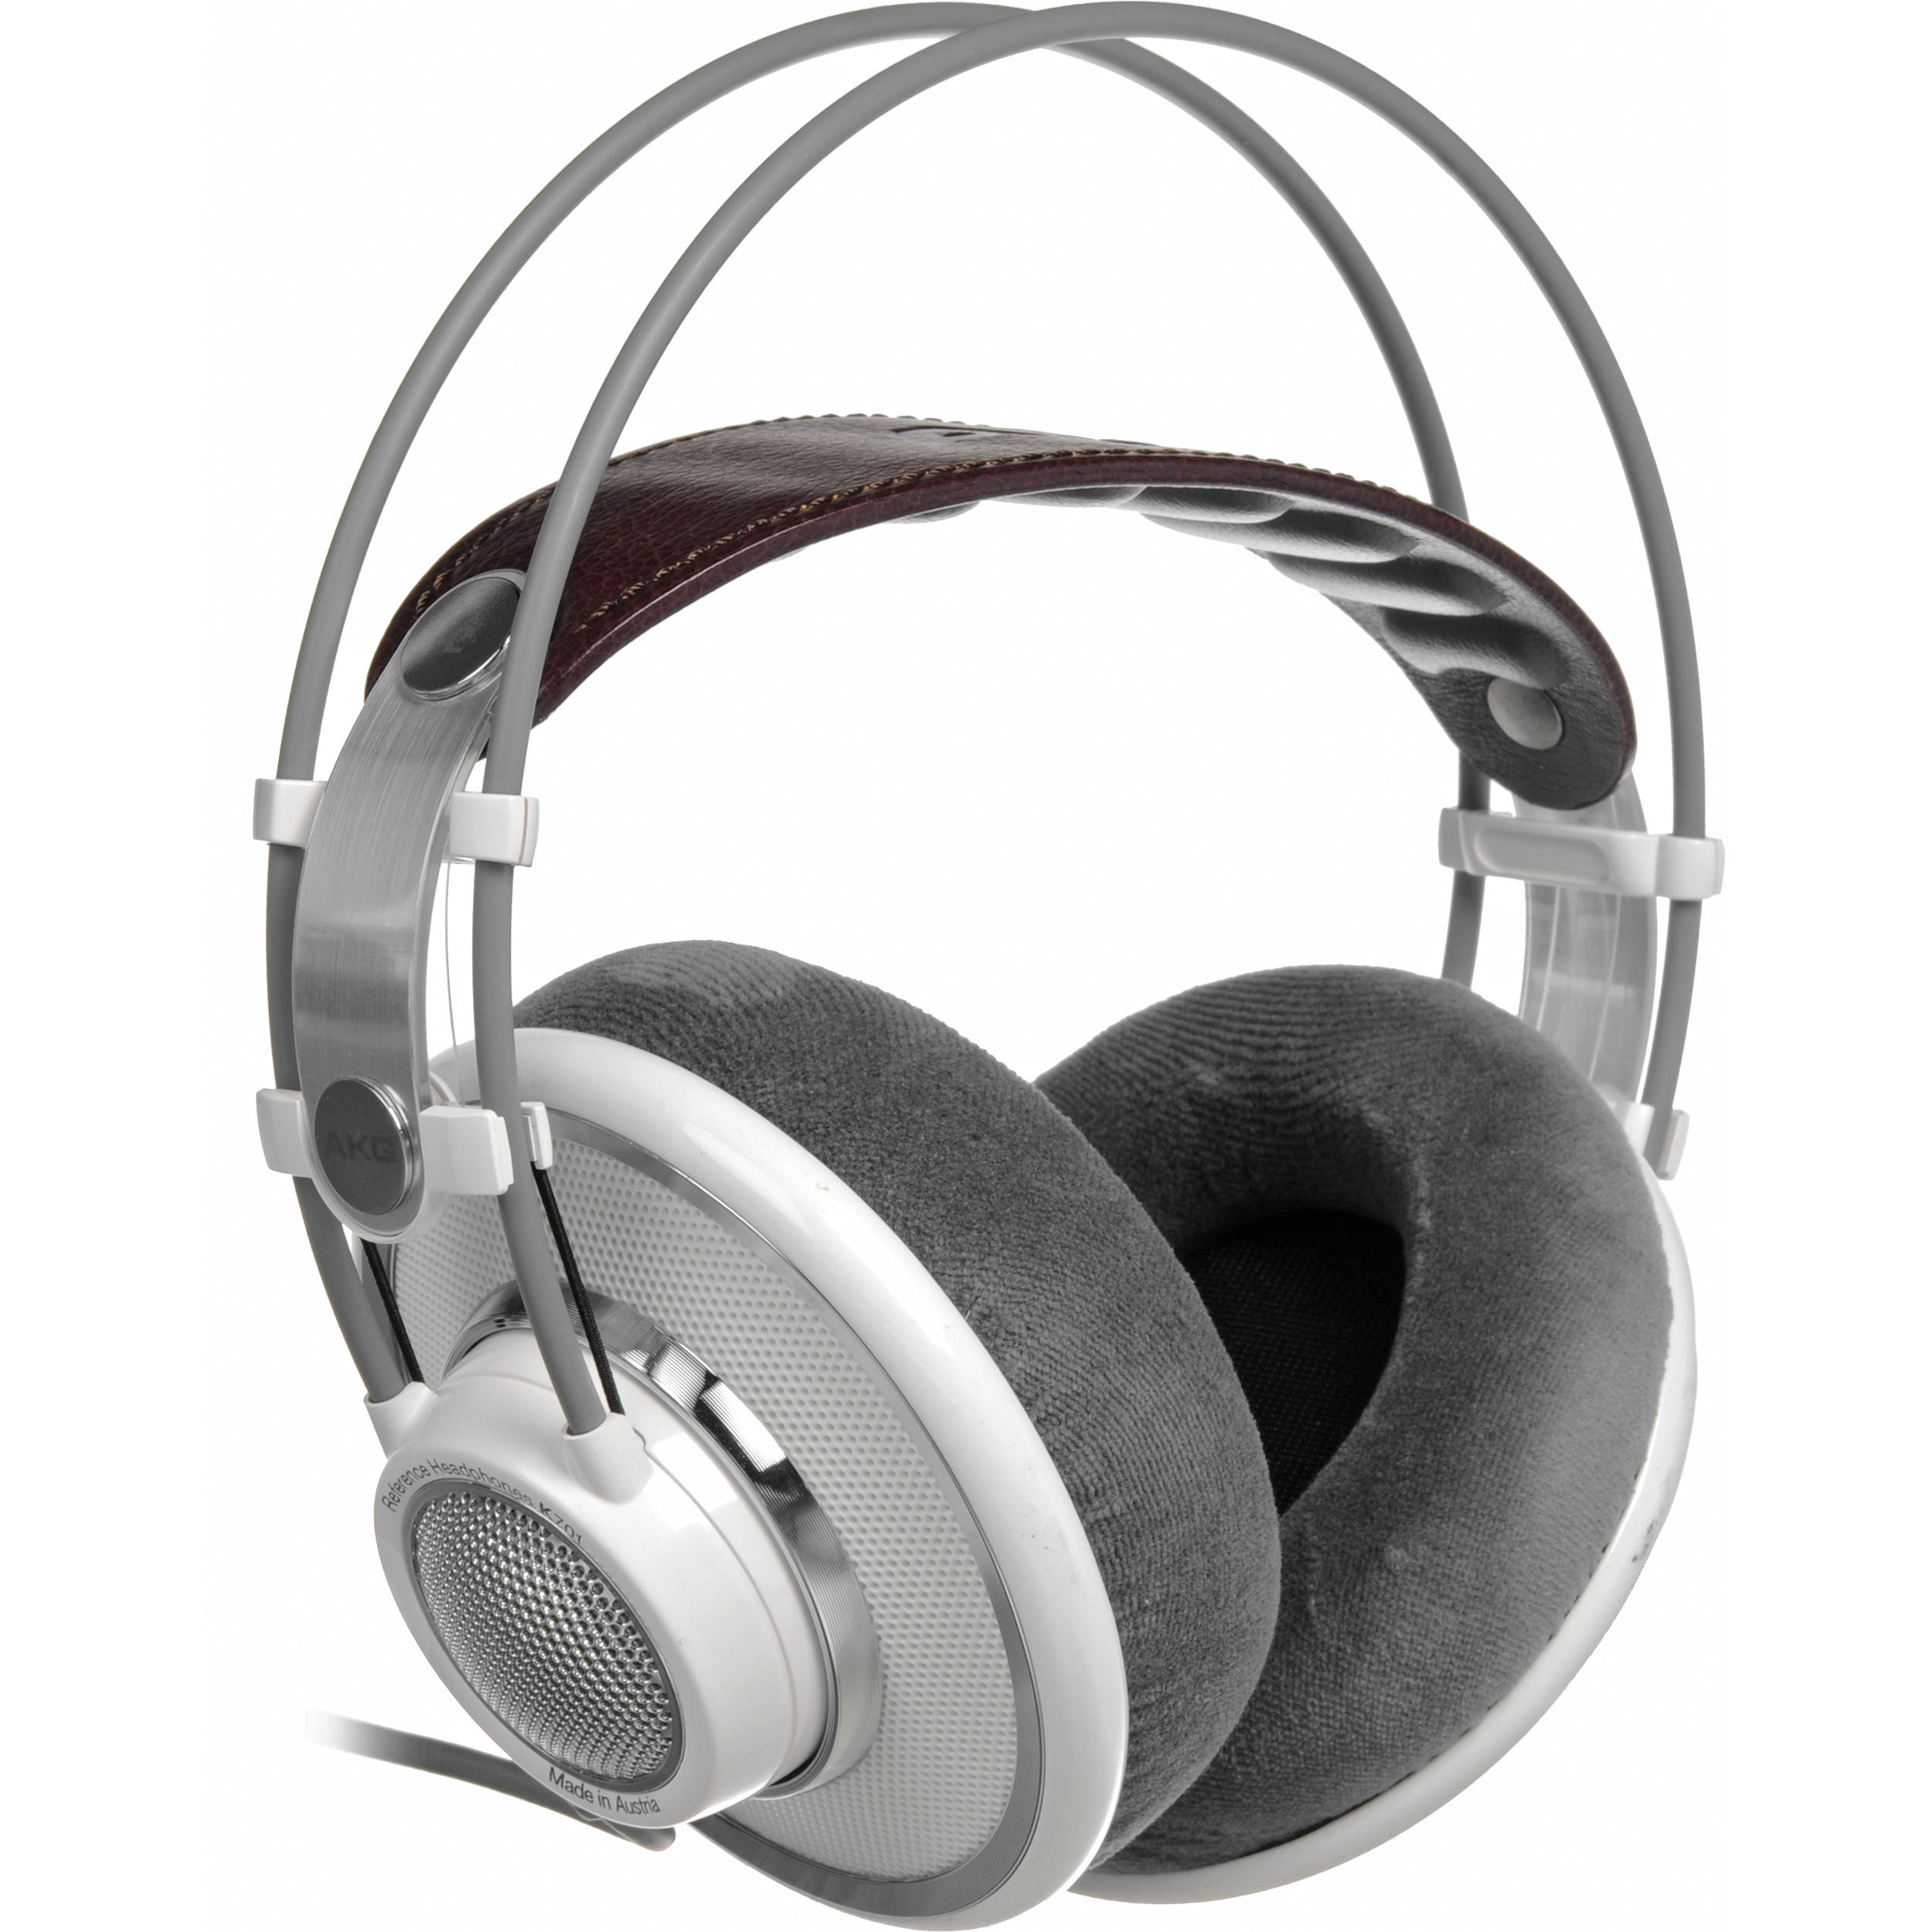 AKG K 701 - Reference Headphones 2458X00180 B&H Photo Video